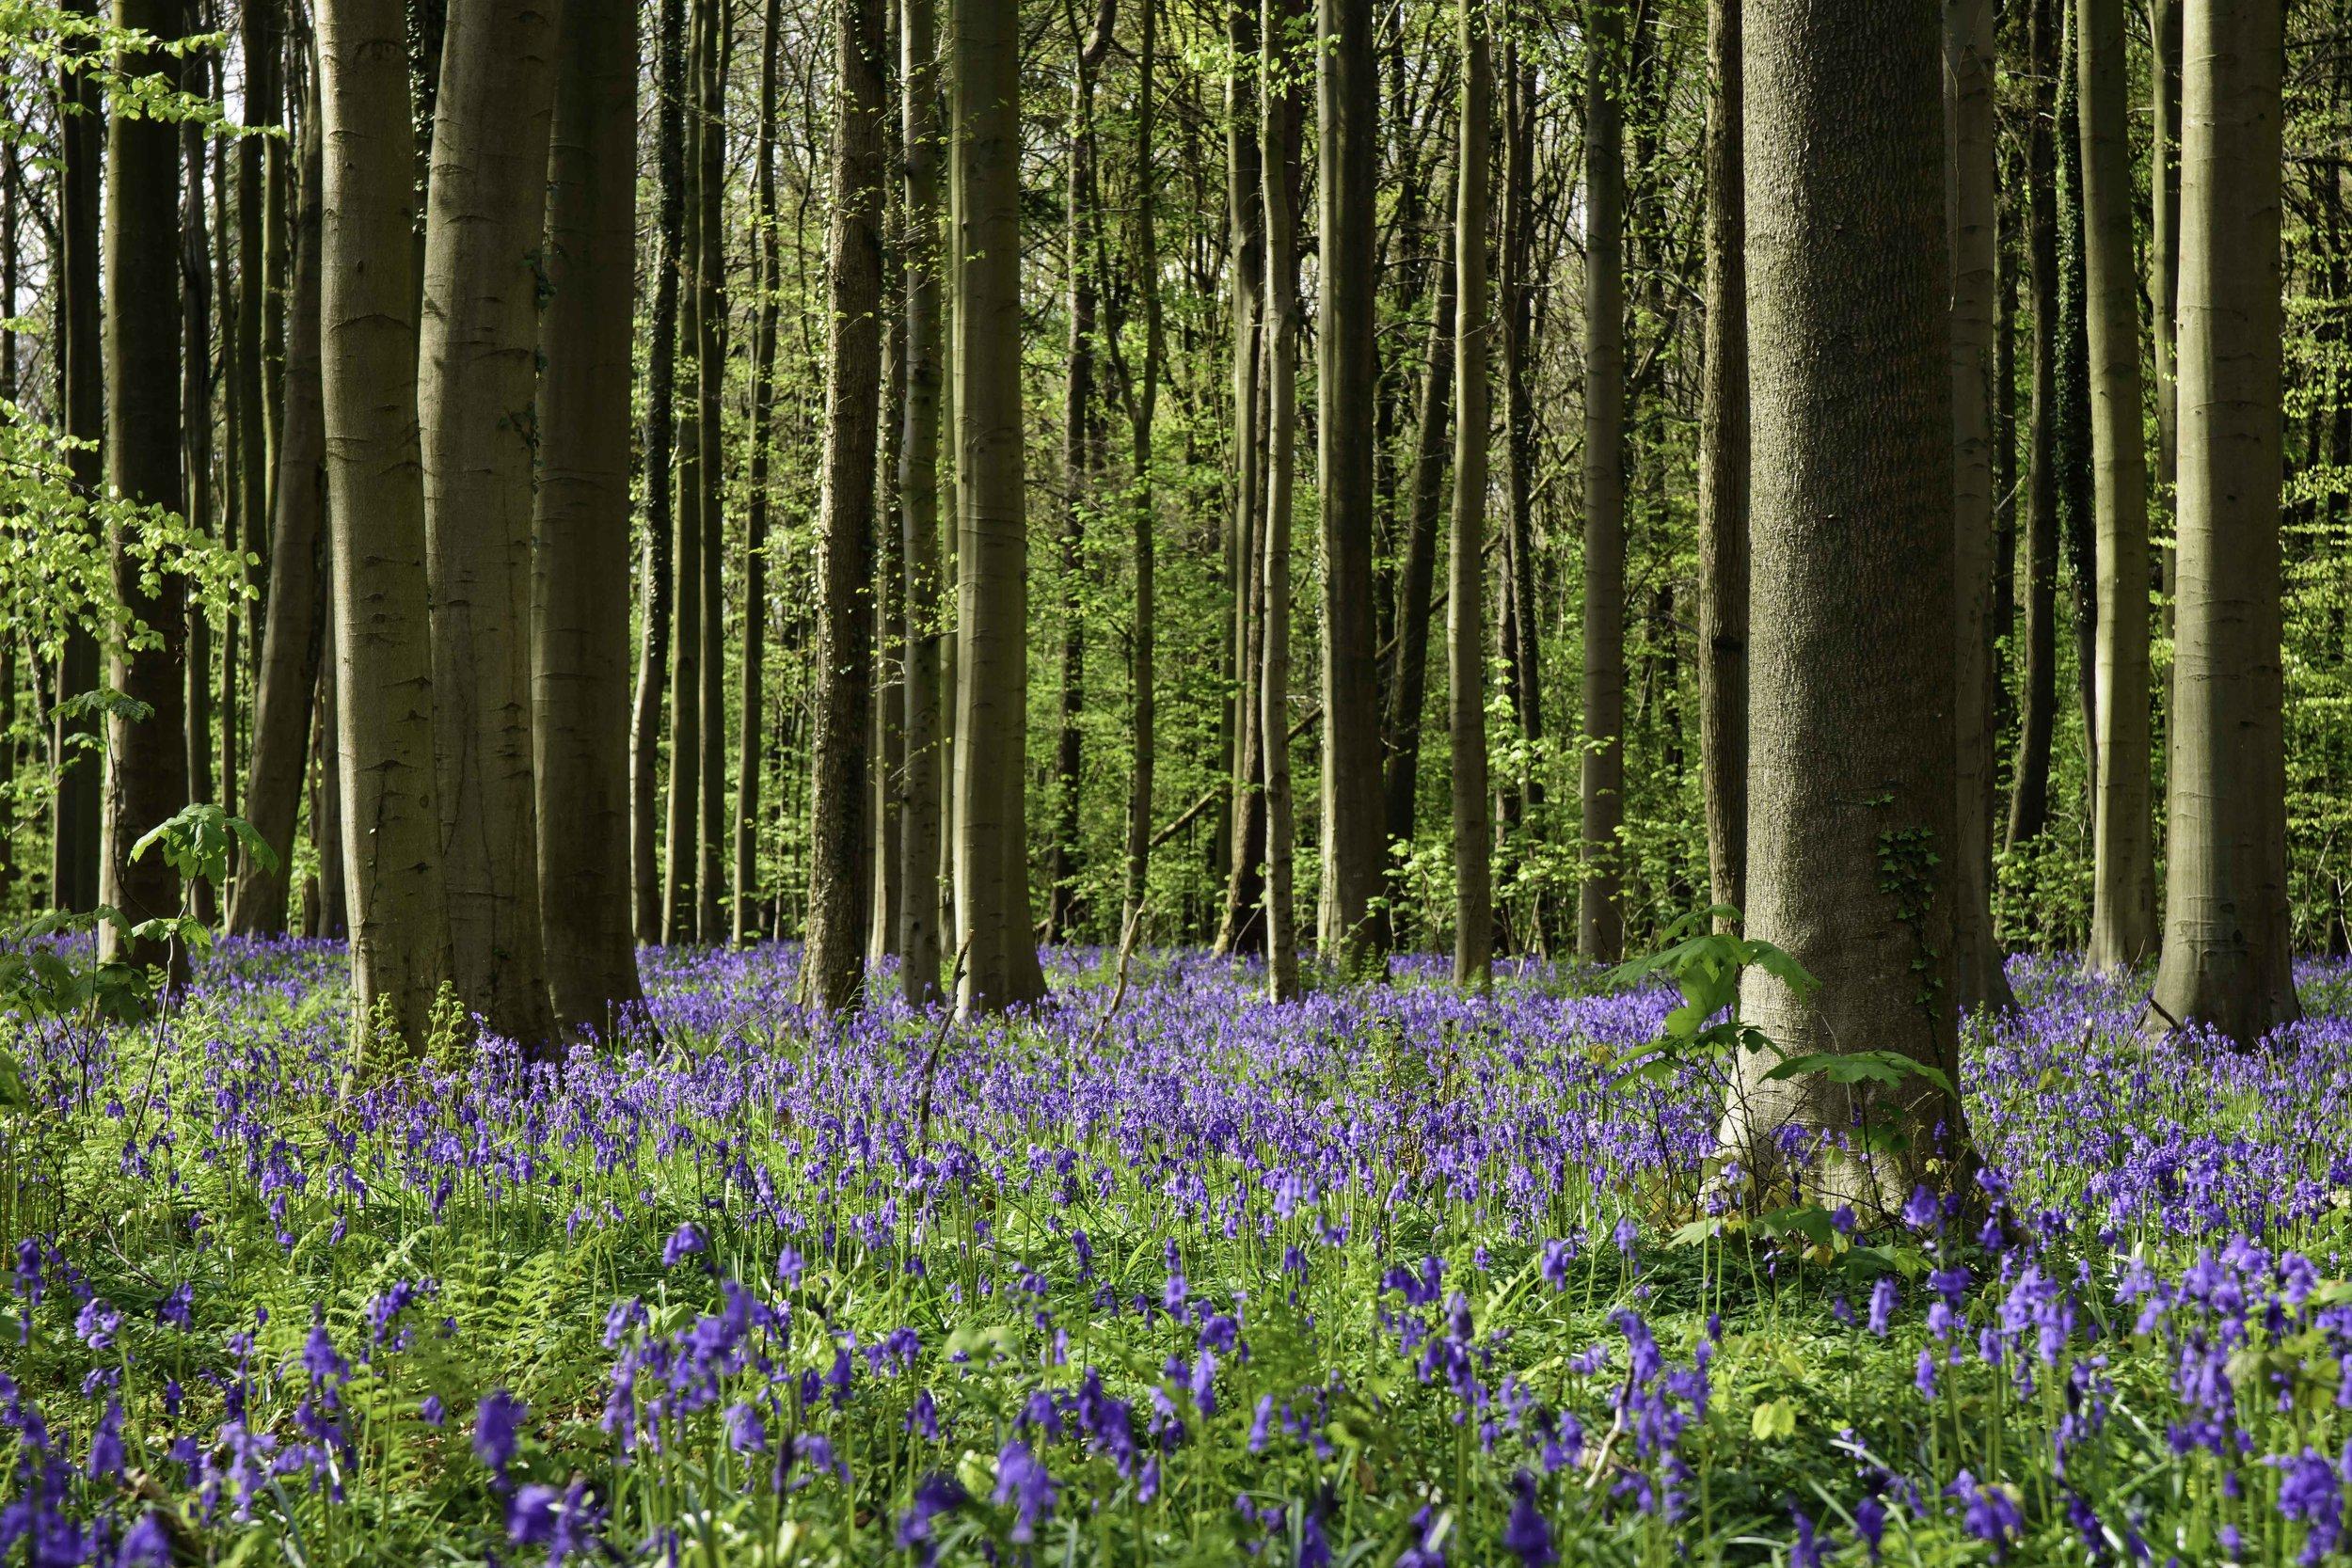 viewfinder-blauwe-hallerbos-fotograferen-tips-natuurfotografie-4